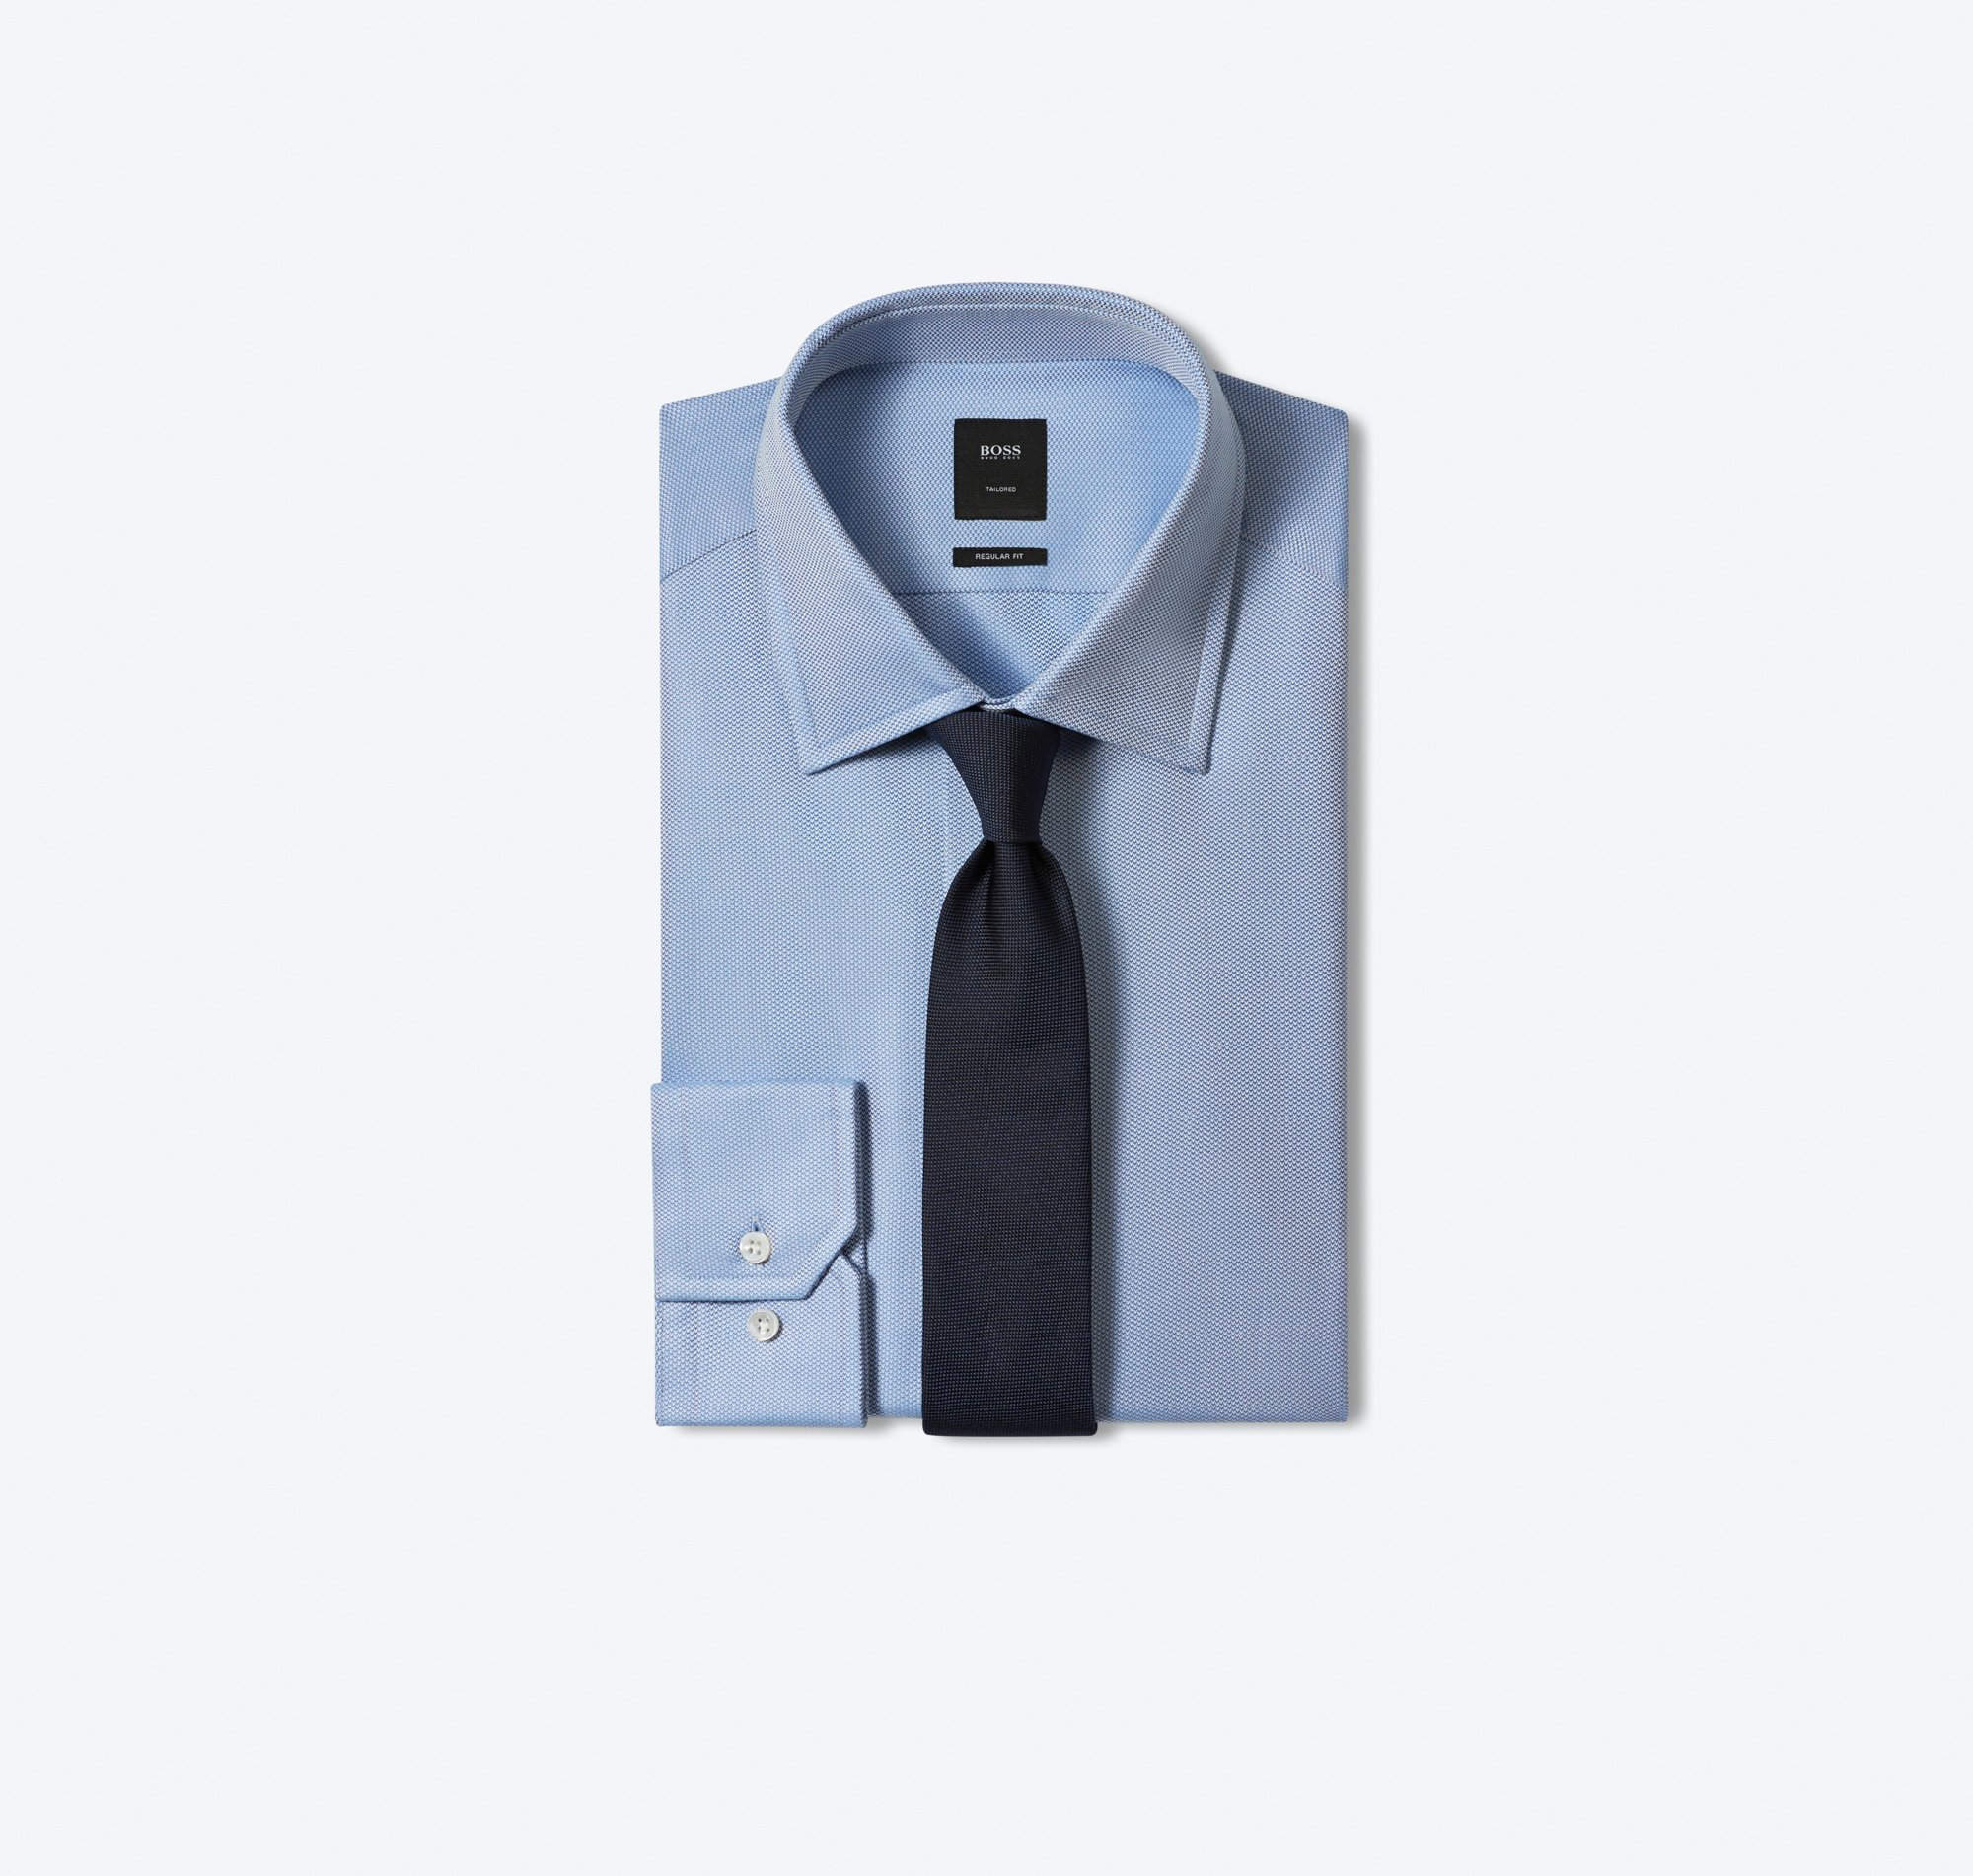 Shirt by BOSS Menswear